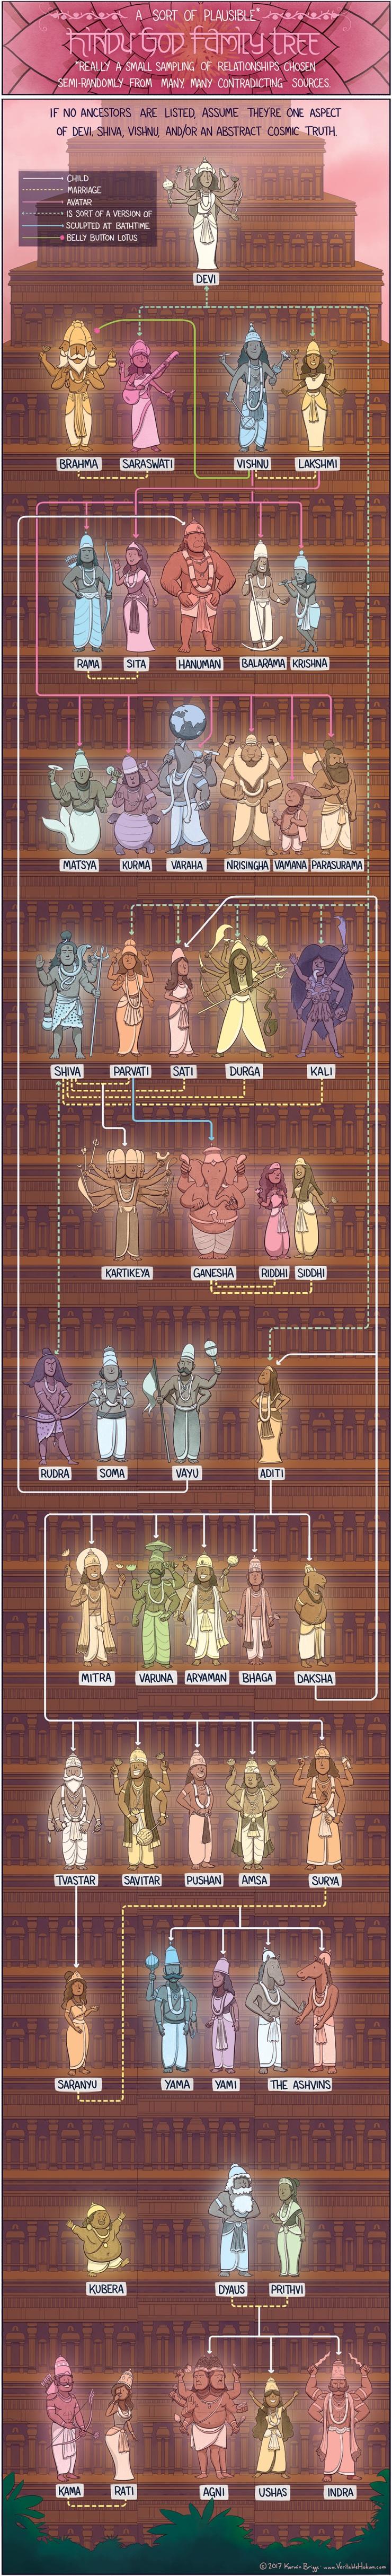 Hindu-Gods-5.jpg